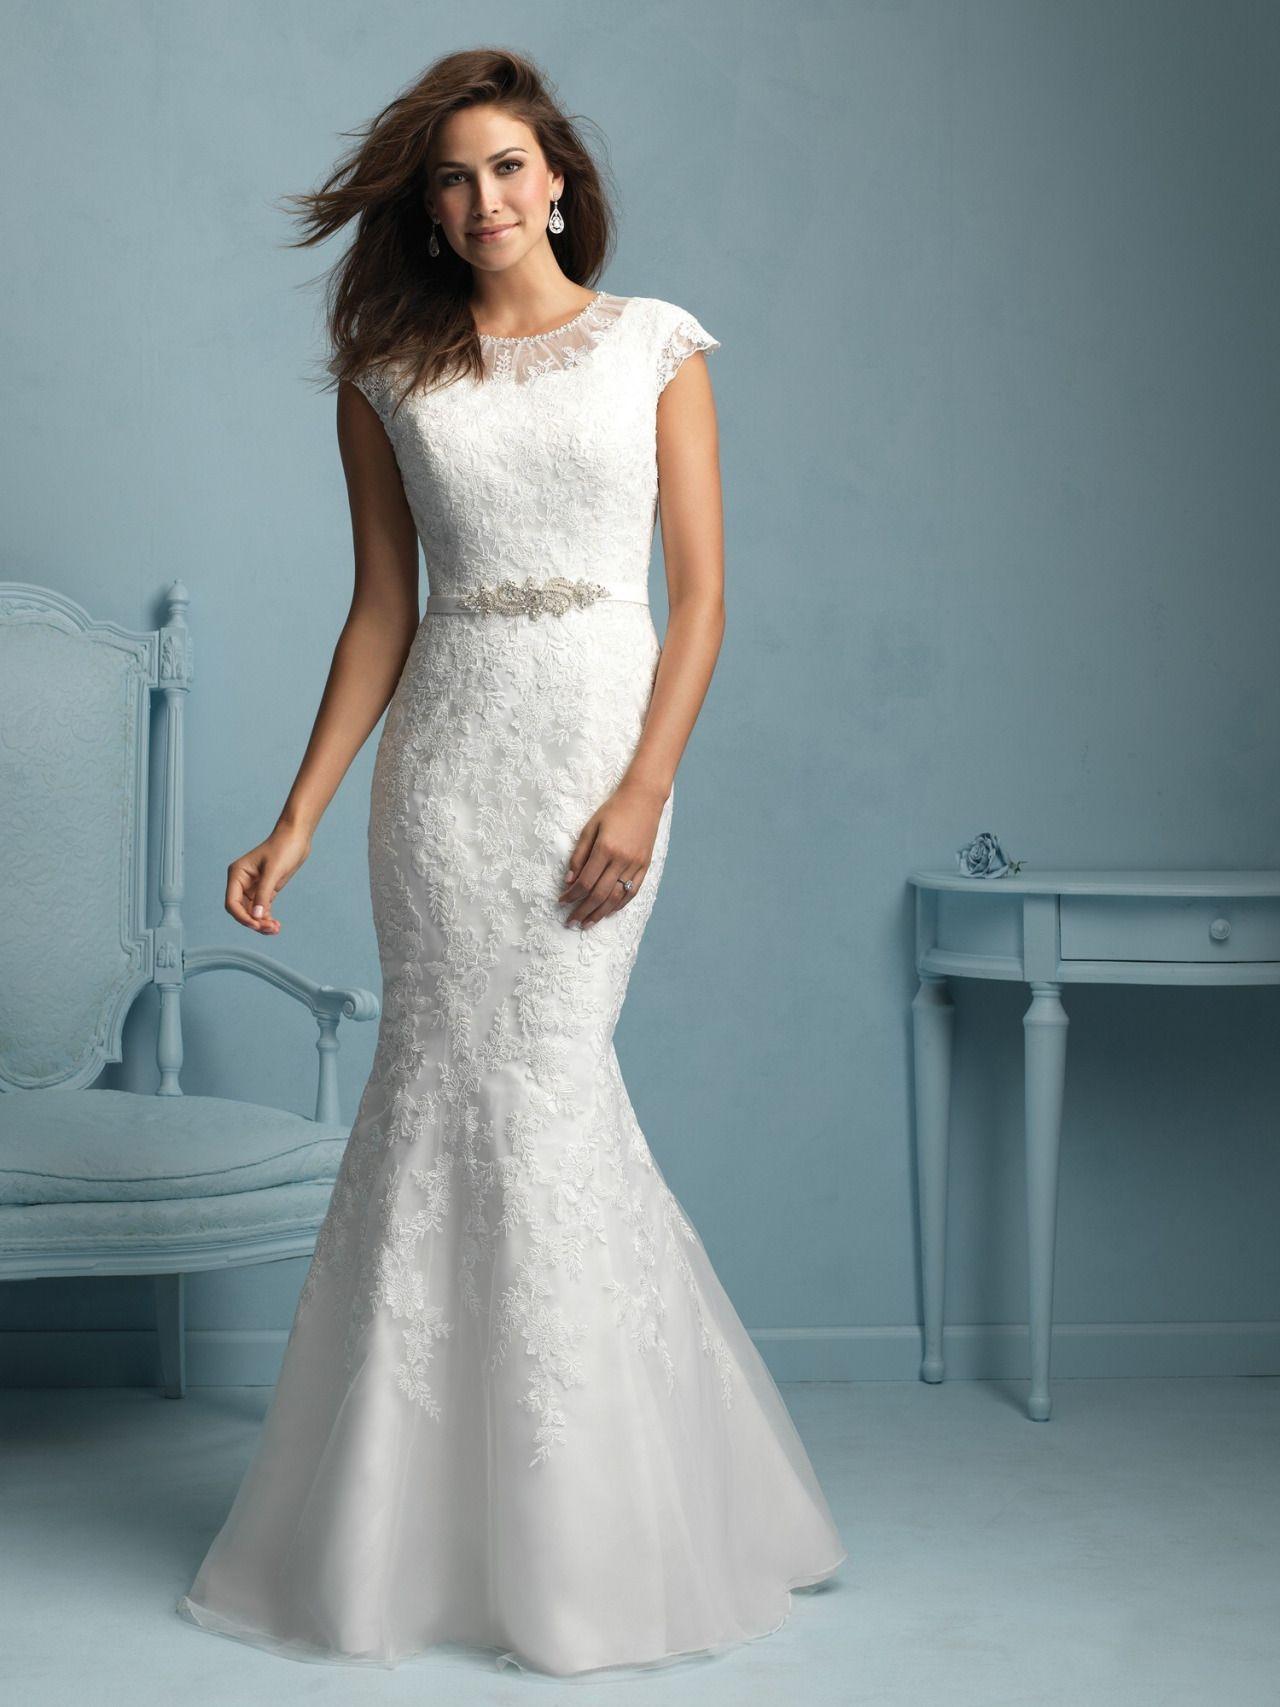 Allure Modest Wedding Dresses - Style M534 only $366.99 expodress ...